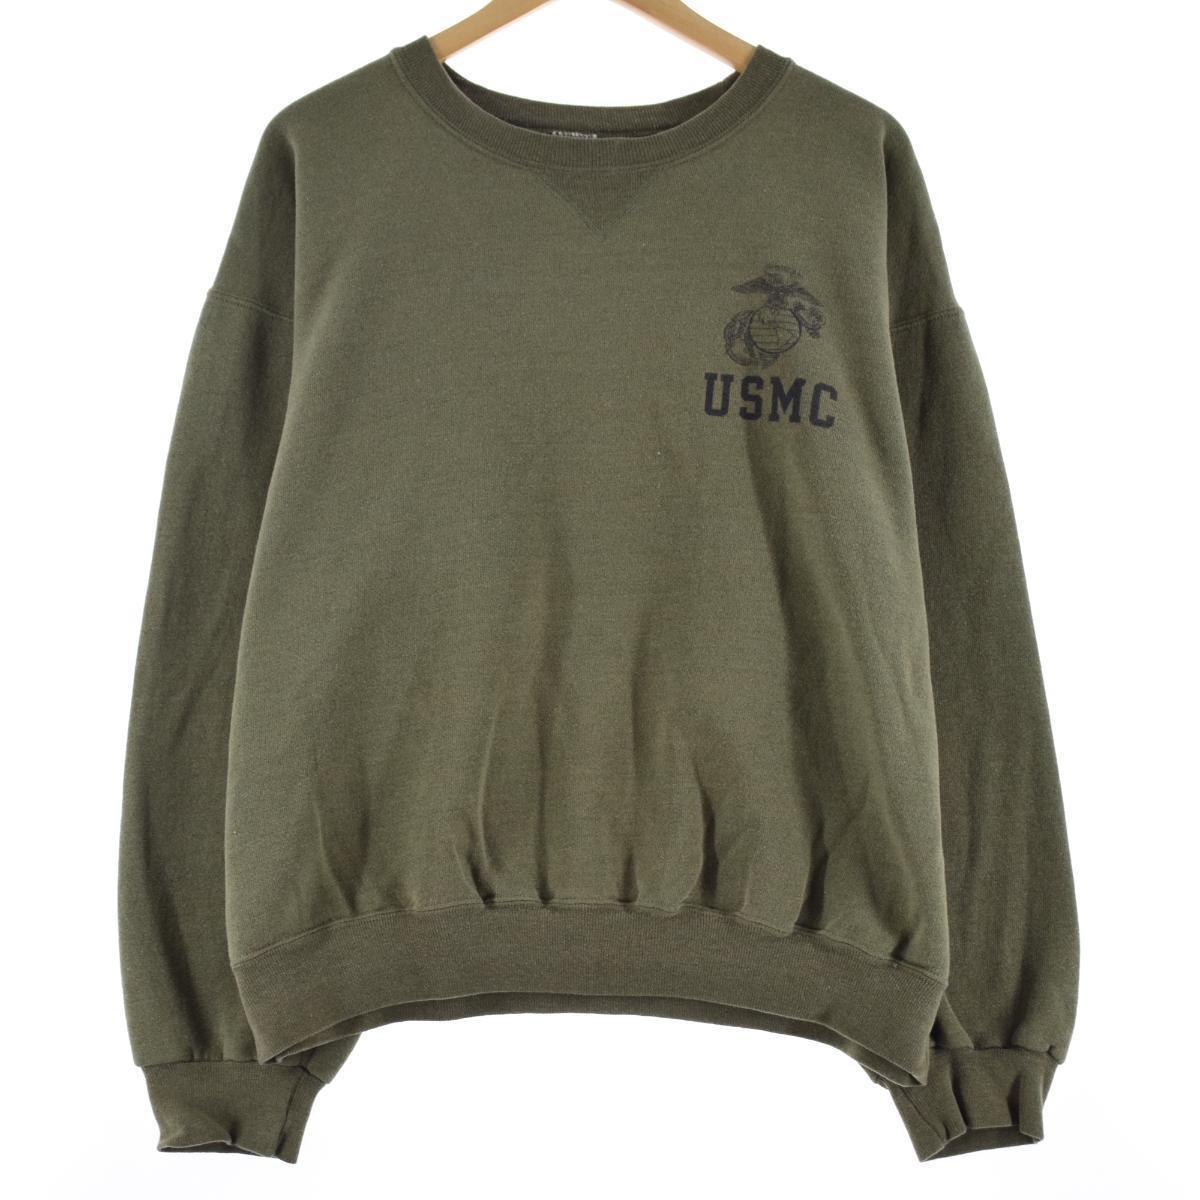 SOFFE USMC アメリカ海兵隊 プリントスウェットシャツ